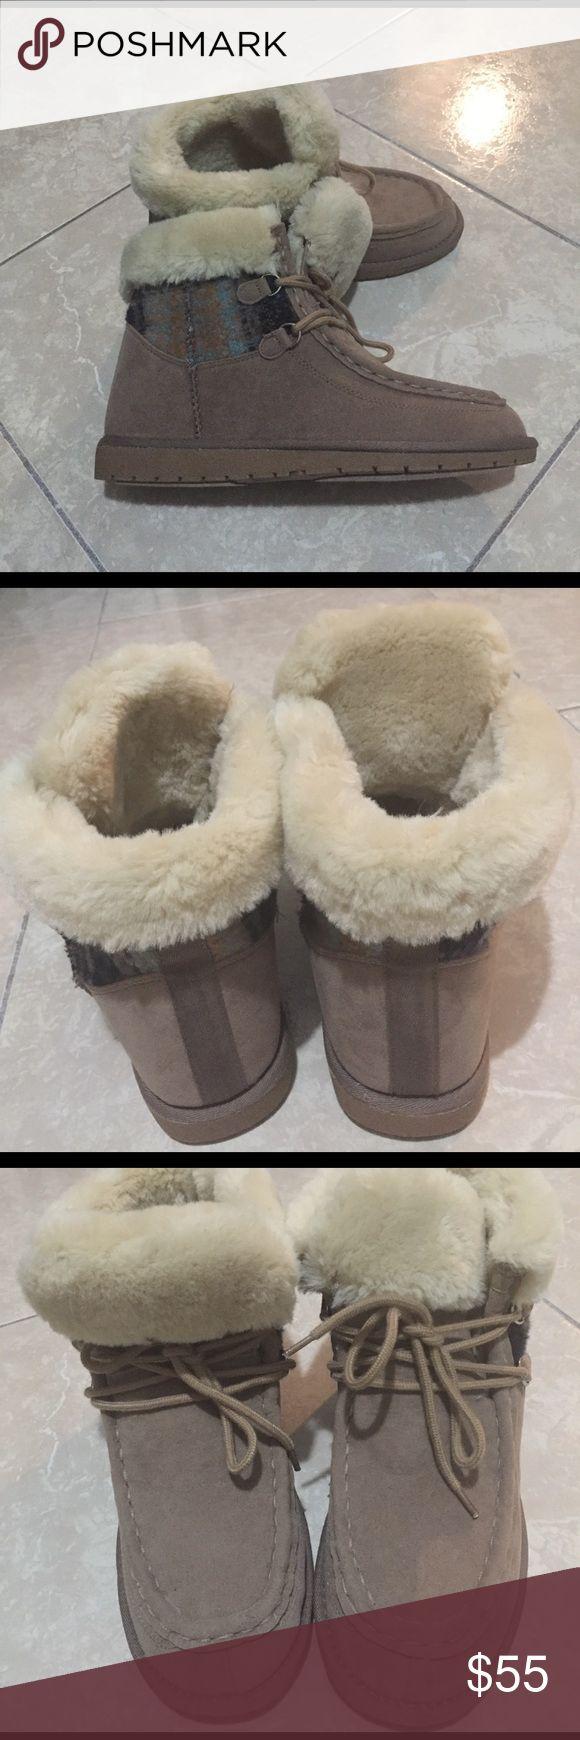 Rampage Faux Fur Ankle Boots Size 9 Rampage Faux Fur Ankle Boots Size 9 Rampage Shoes Ankle Boots & Booties